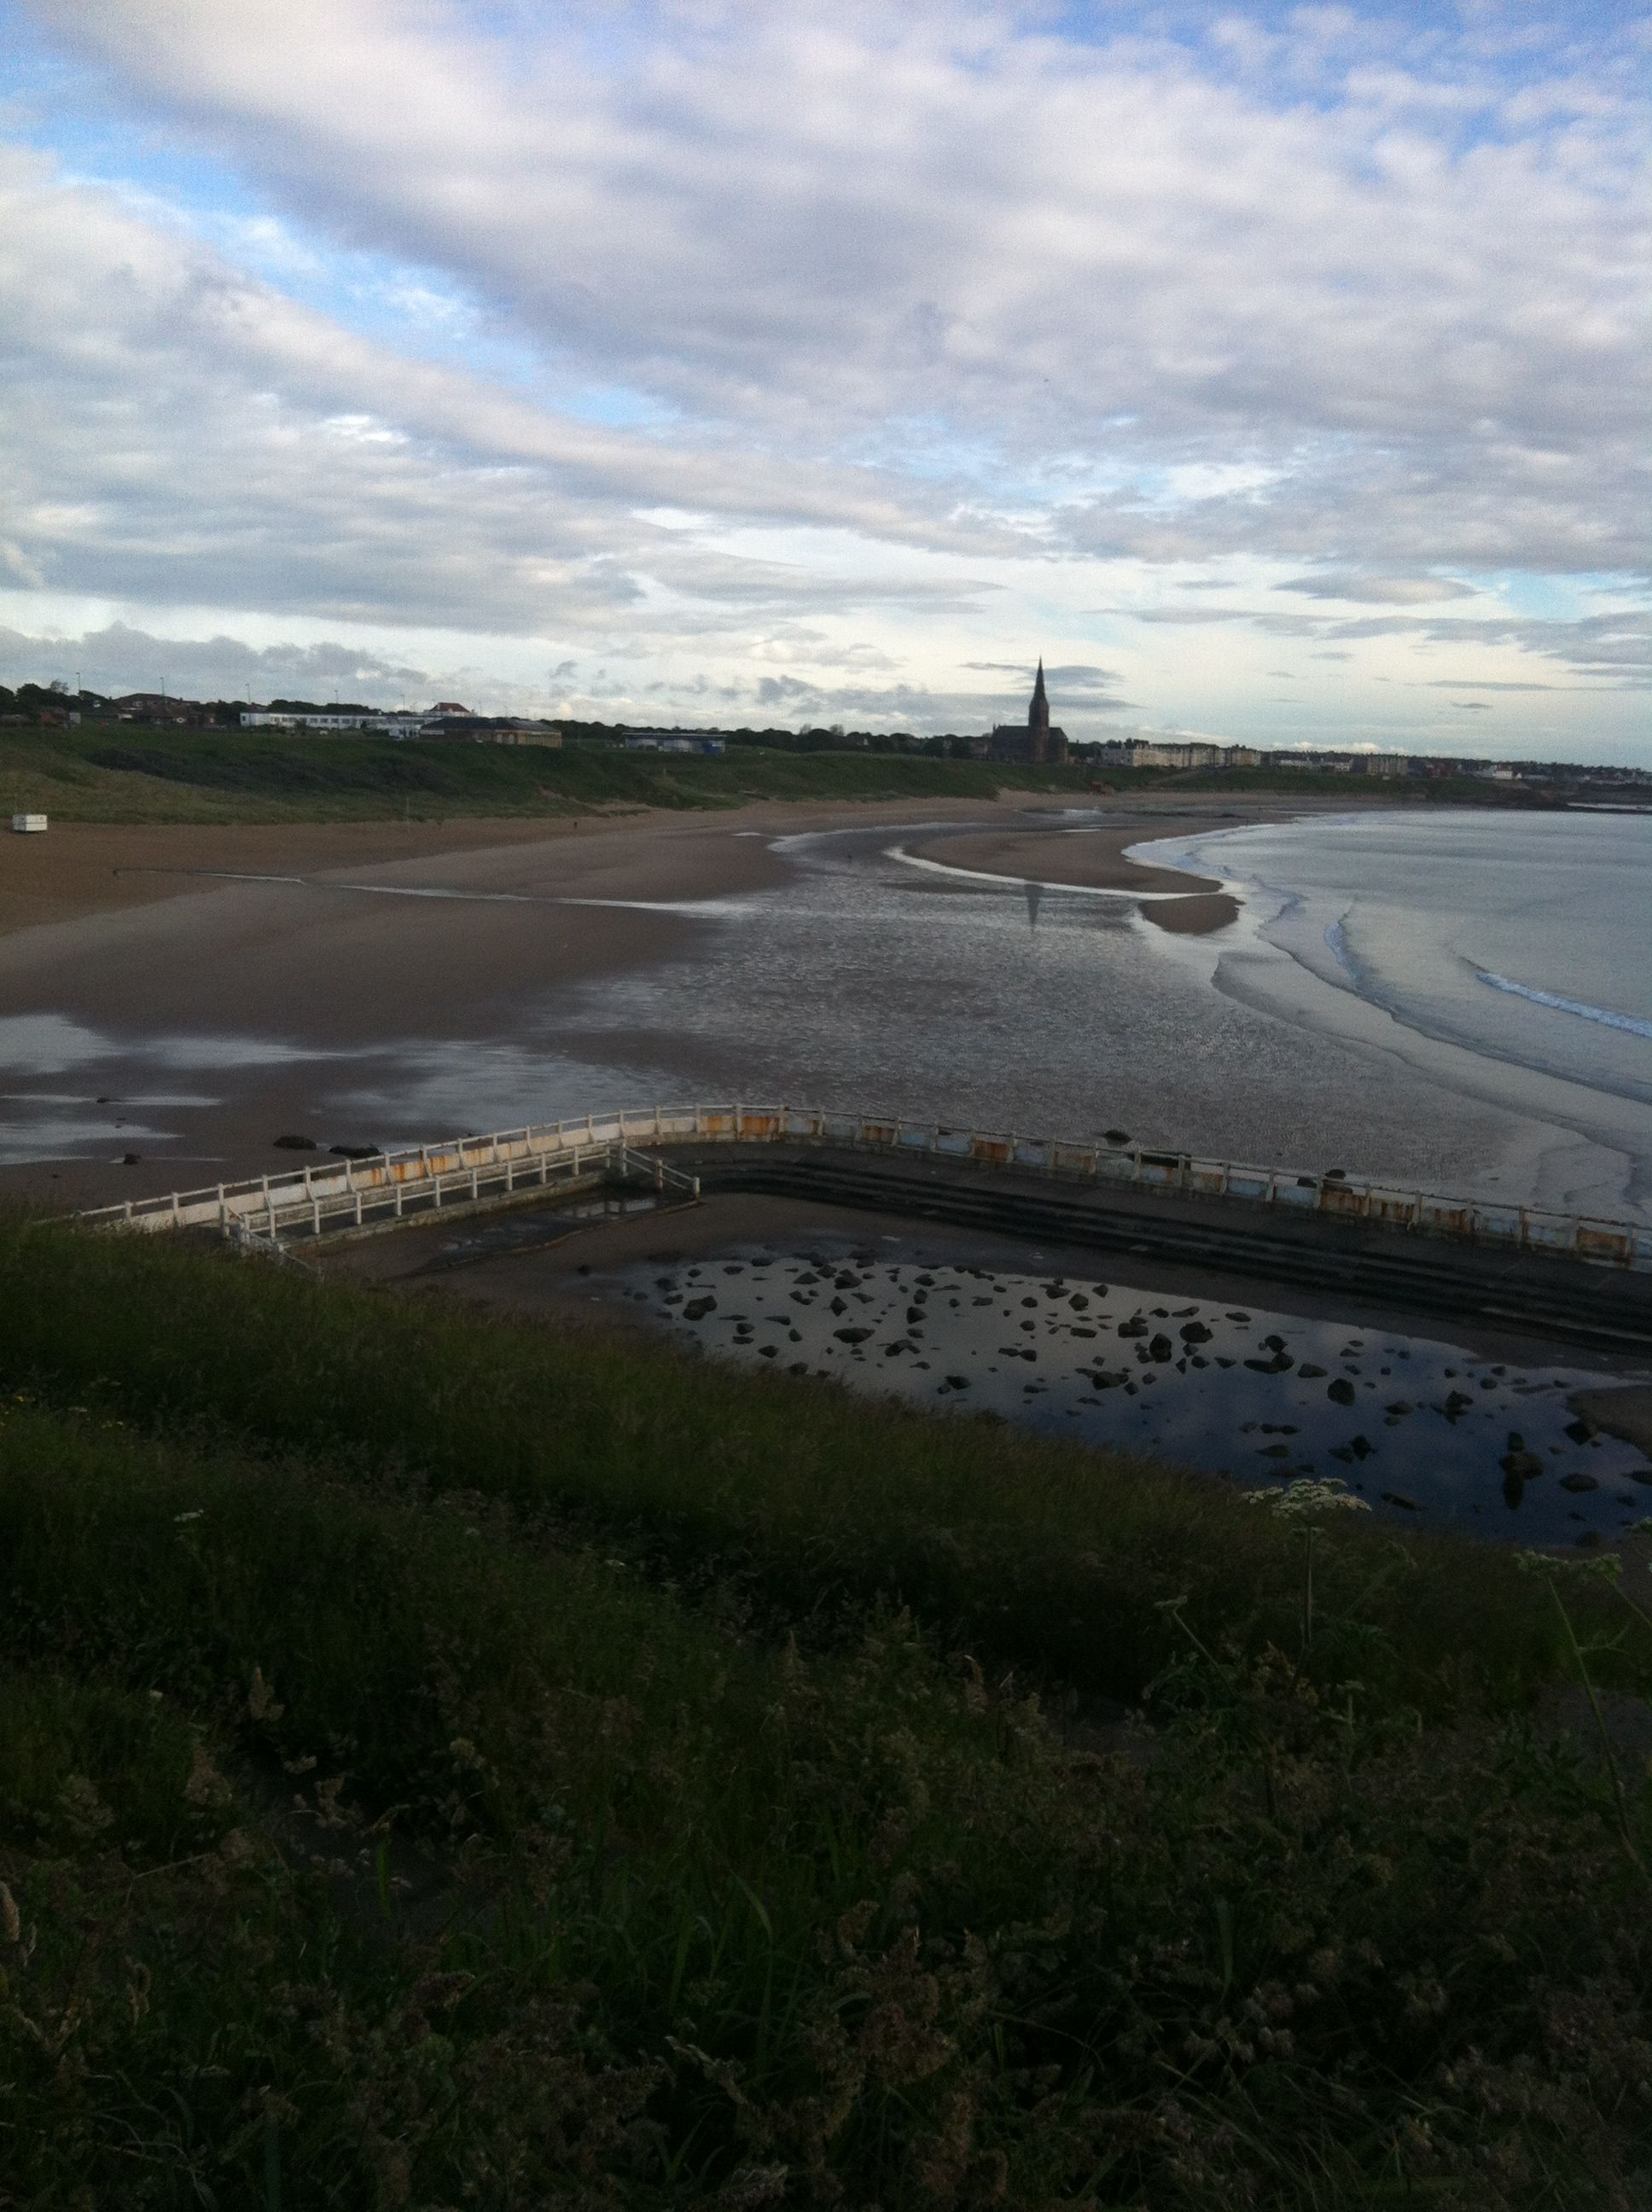 Tynemouth long sands beach 23 June 7am 2013 www.tynemouthwebcam.com